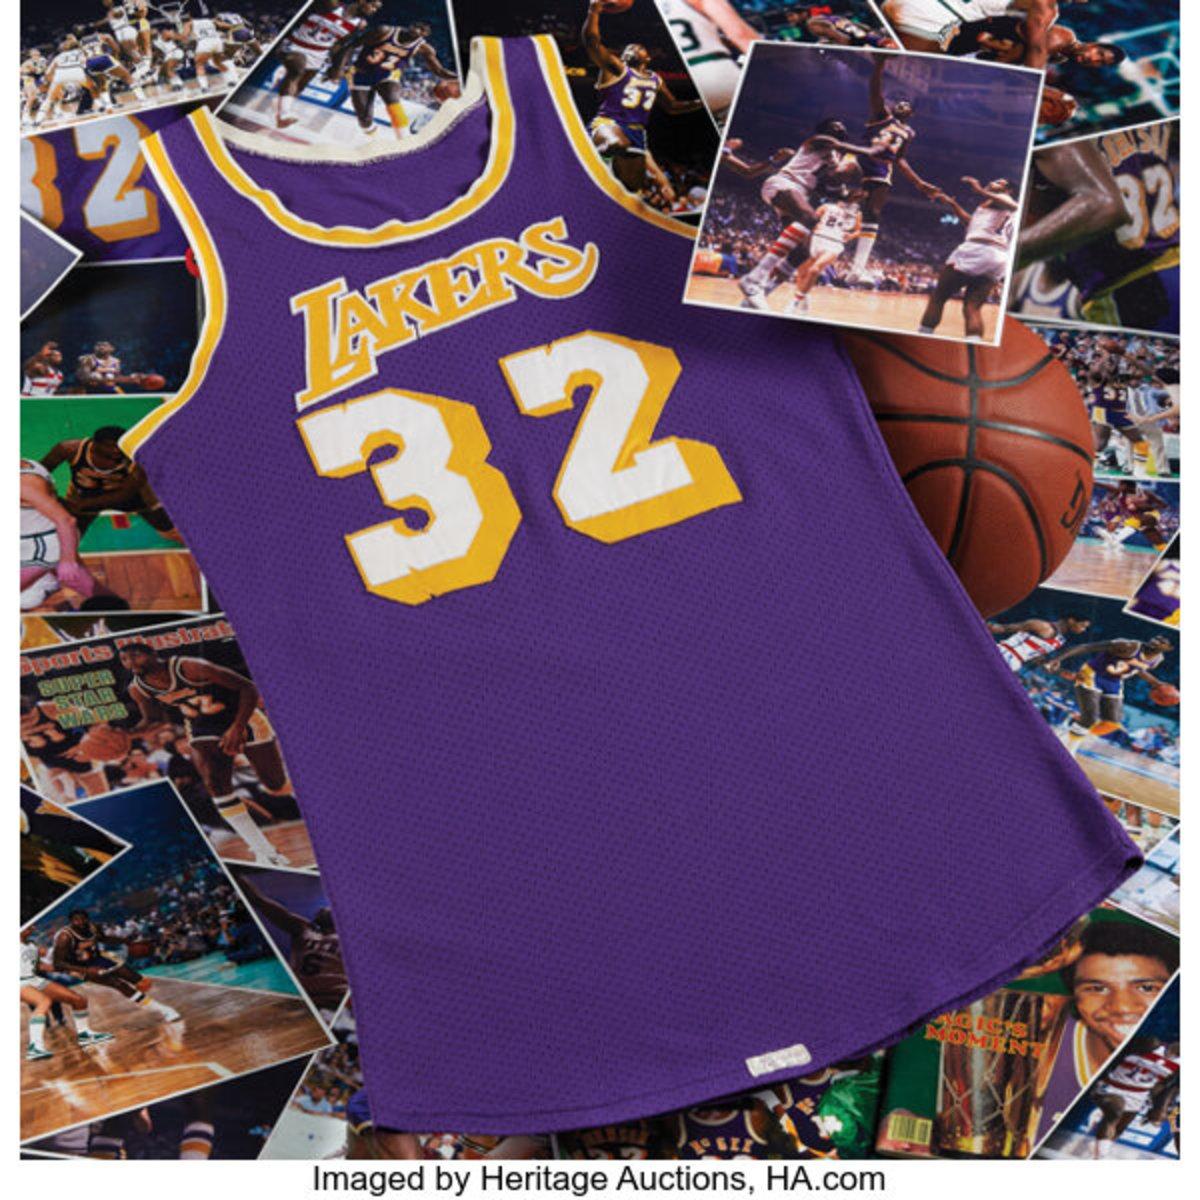 Magic Johnson game-worn jersey from 1980.